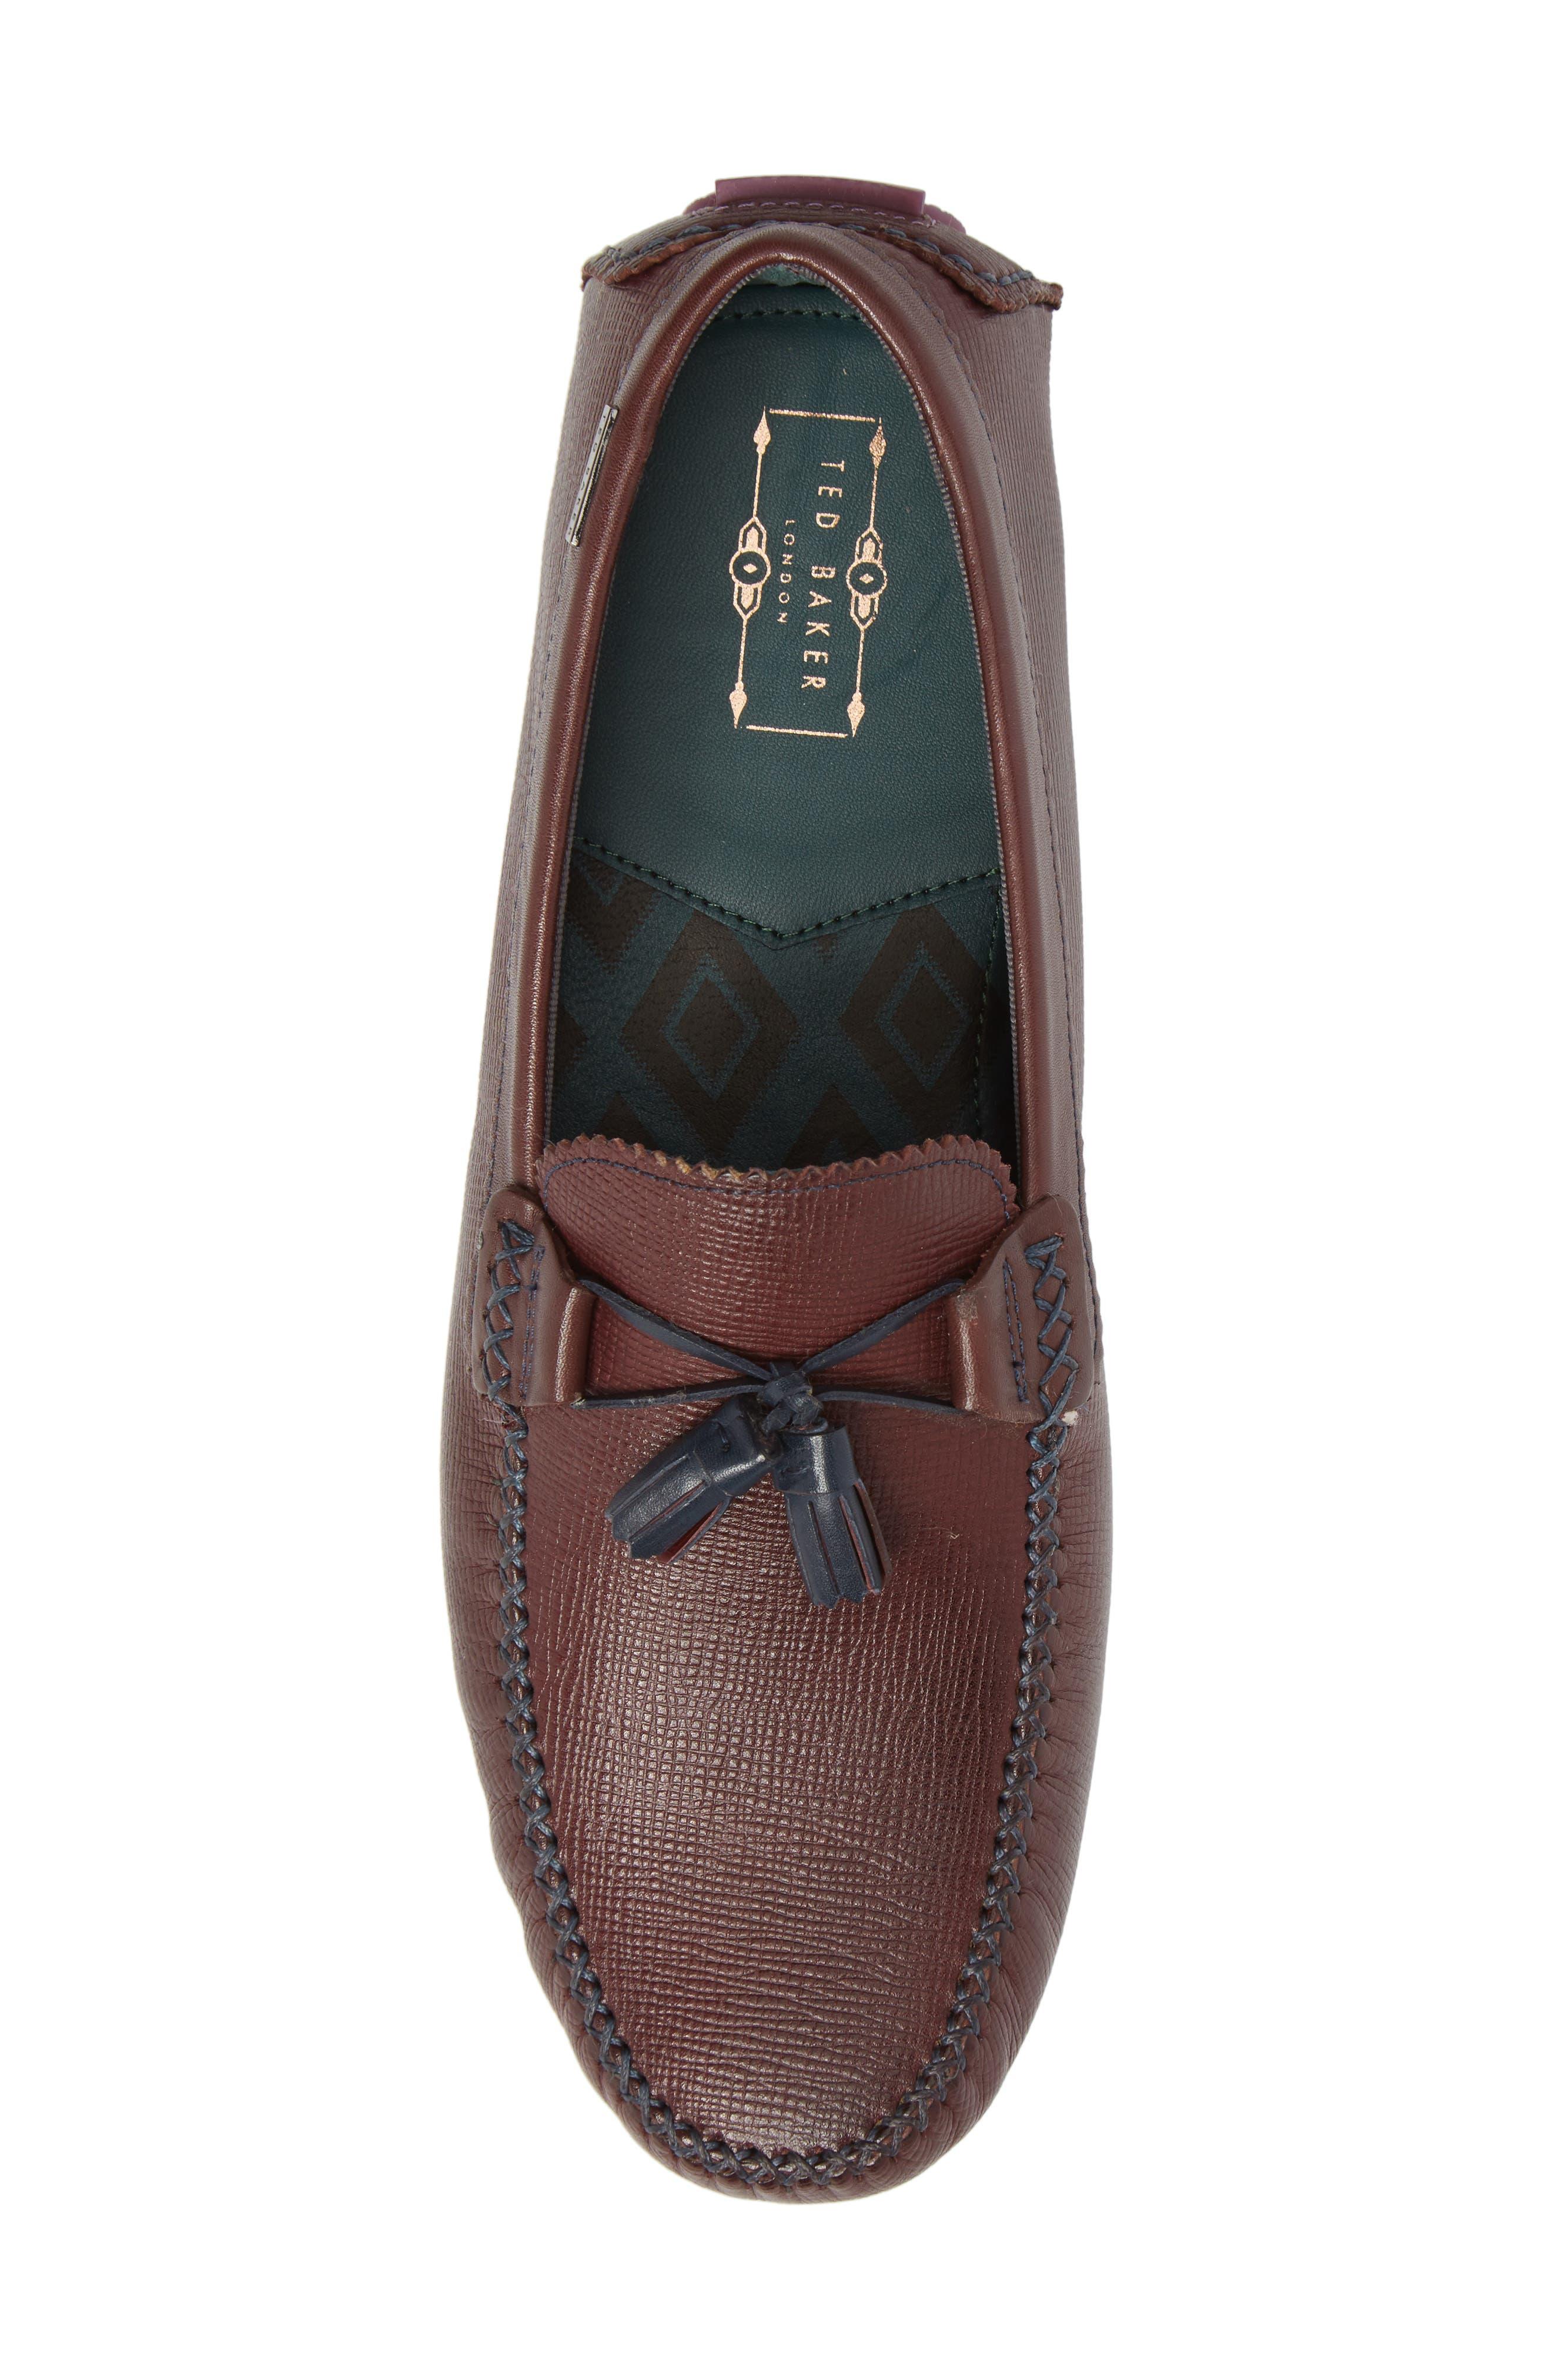 Urbonn Tasseled Driving Loafer,                             Alternate thumbnail 5, color,                             Dark Red Leather